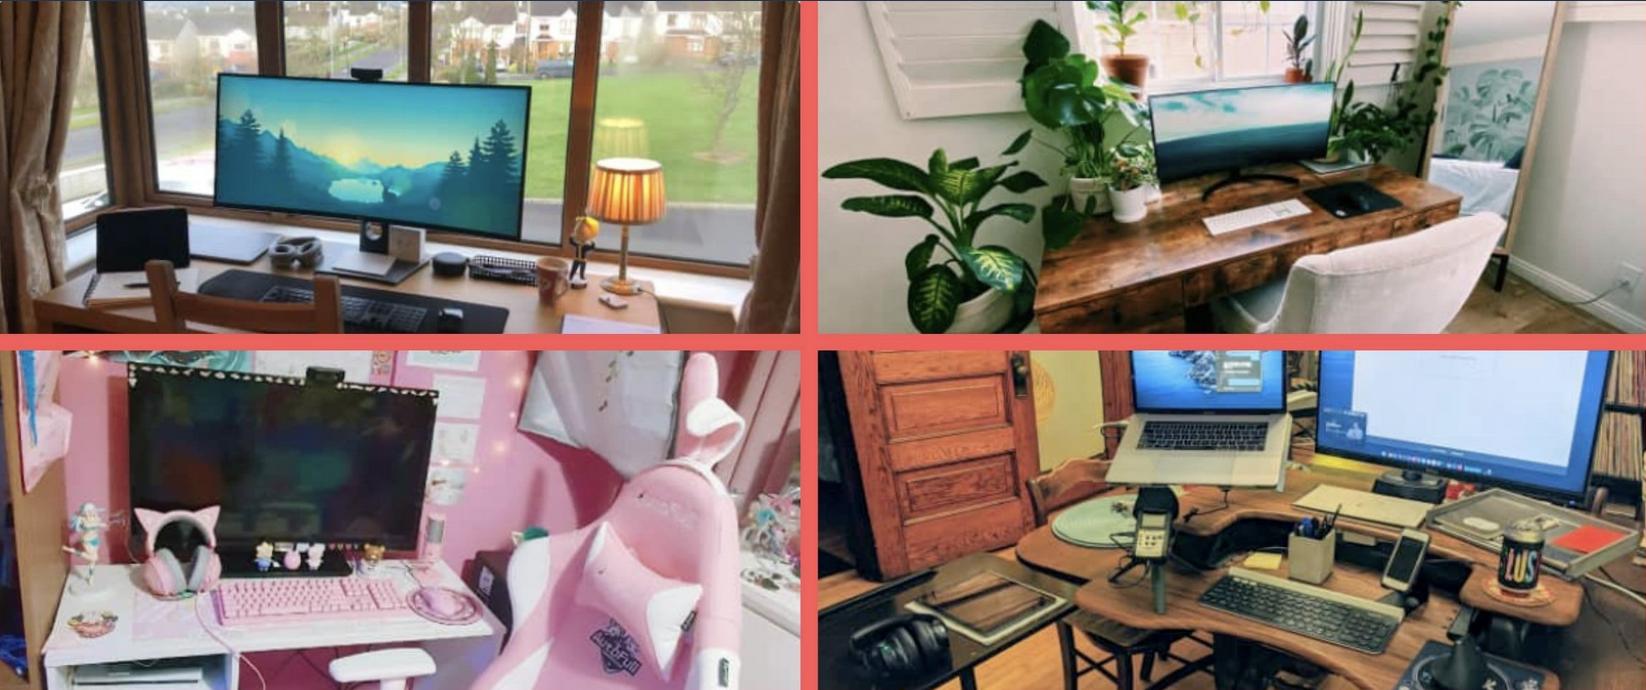 Four different office setups and desks